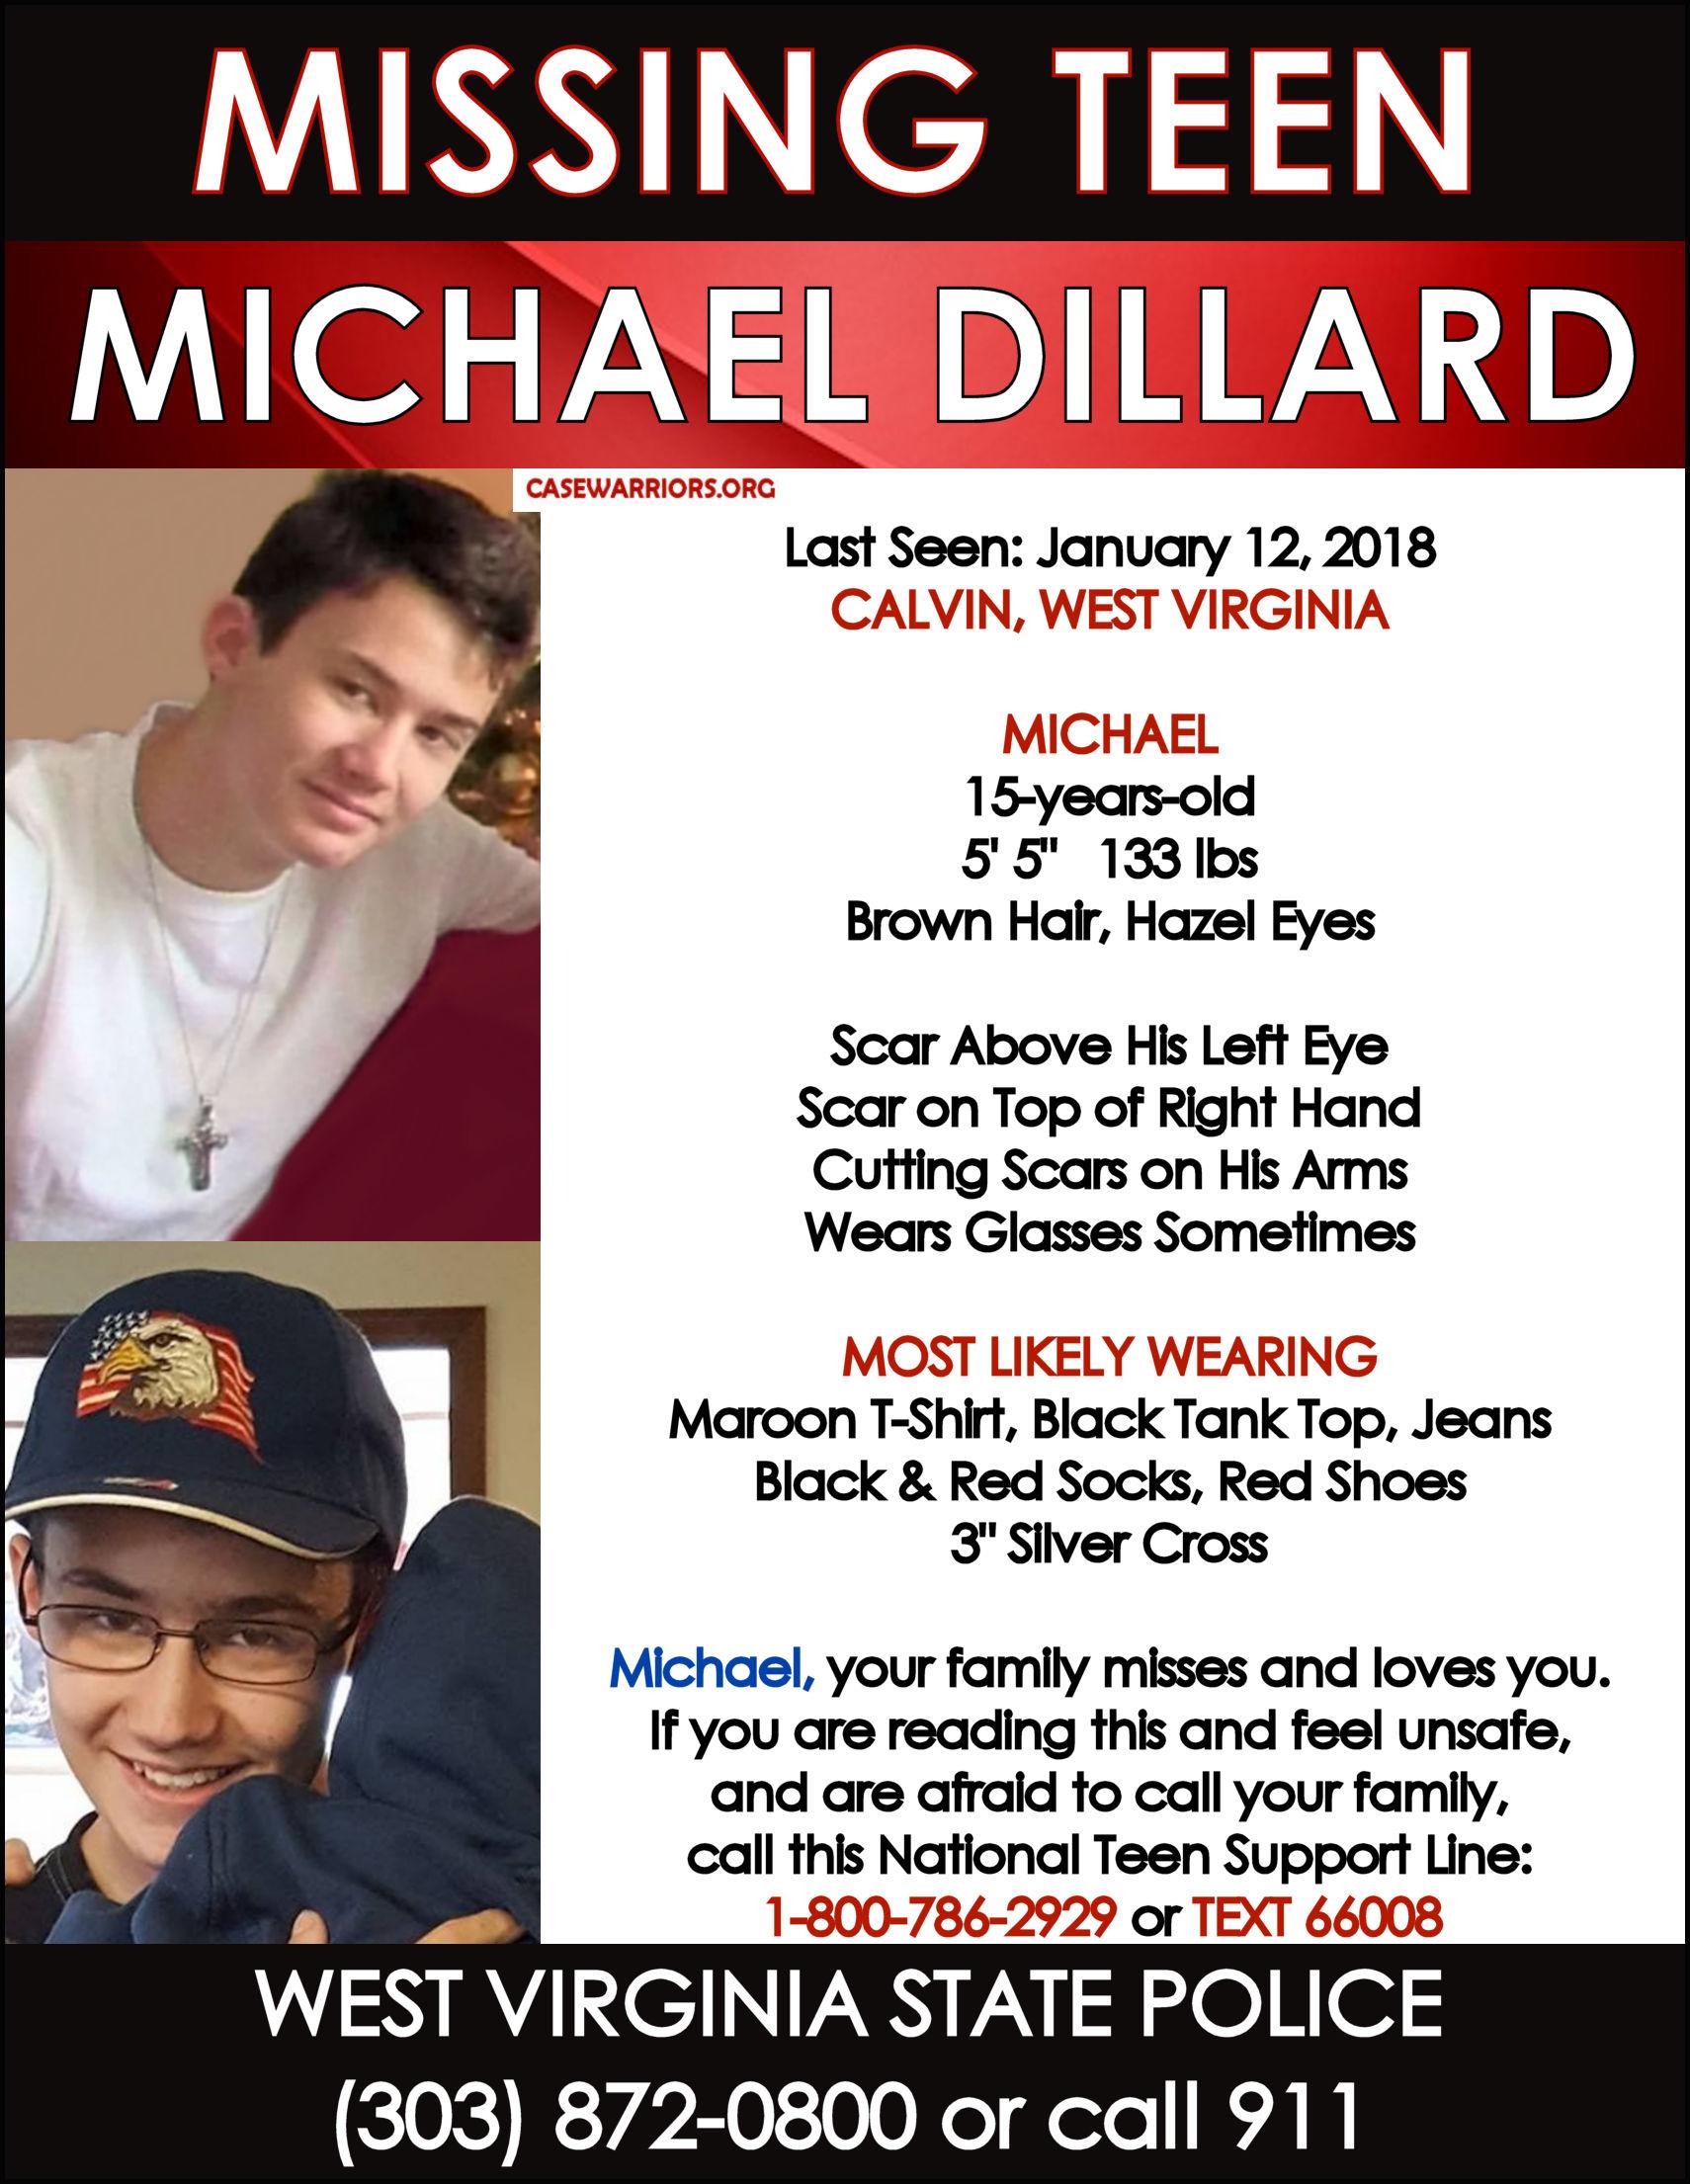 MICHAEL DILLARD